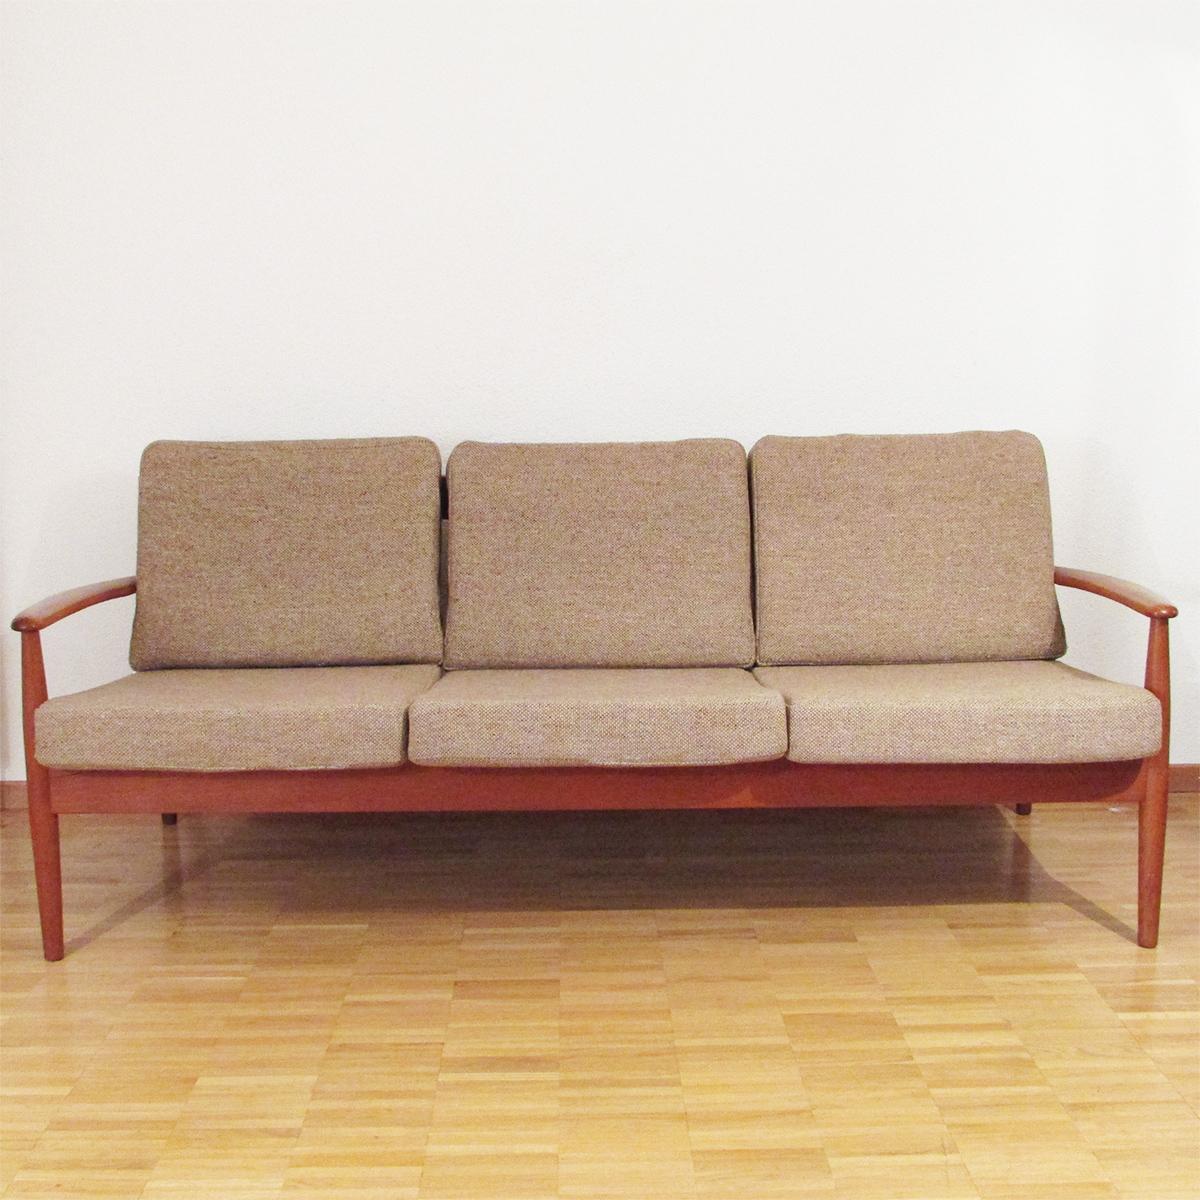 grete jalk canap teck les illumin s design. Black Bedroom Furniture Sets. Home Design Ideas